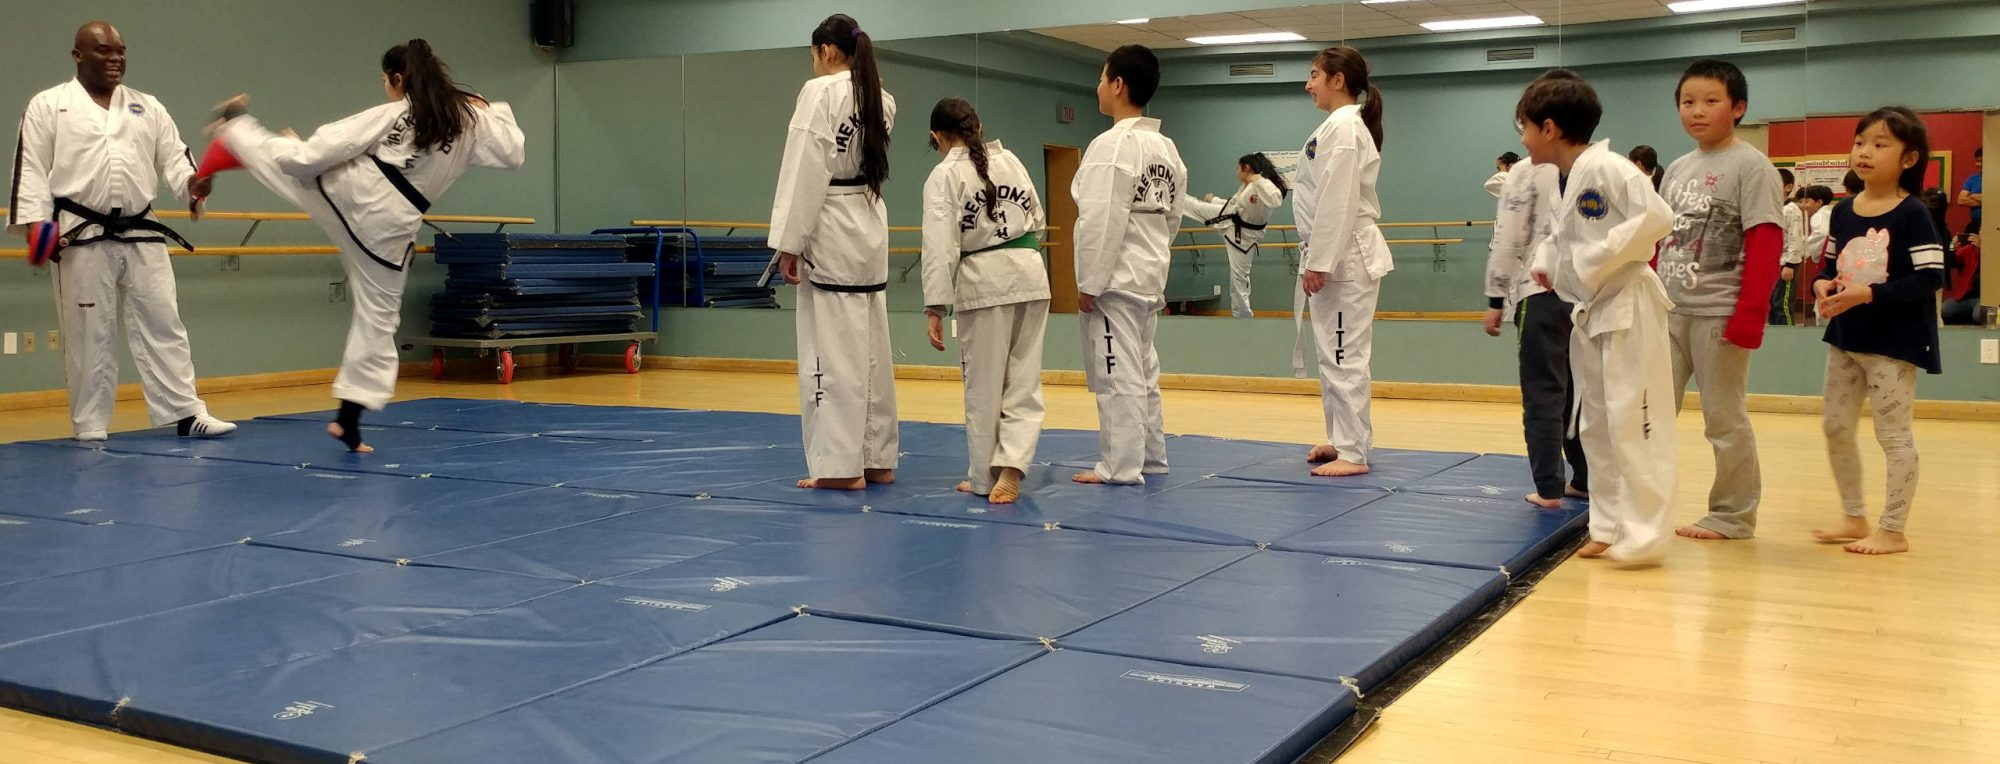 Etienne's International Taekwon-Do Academy